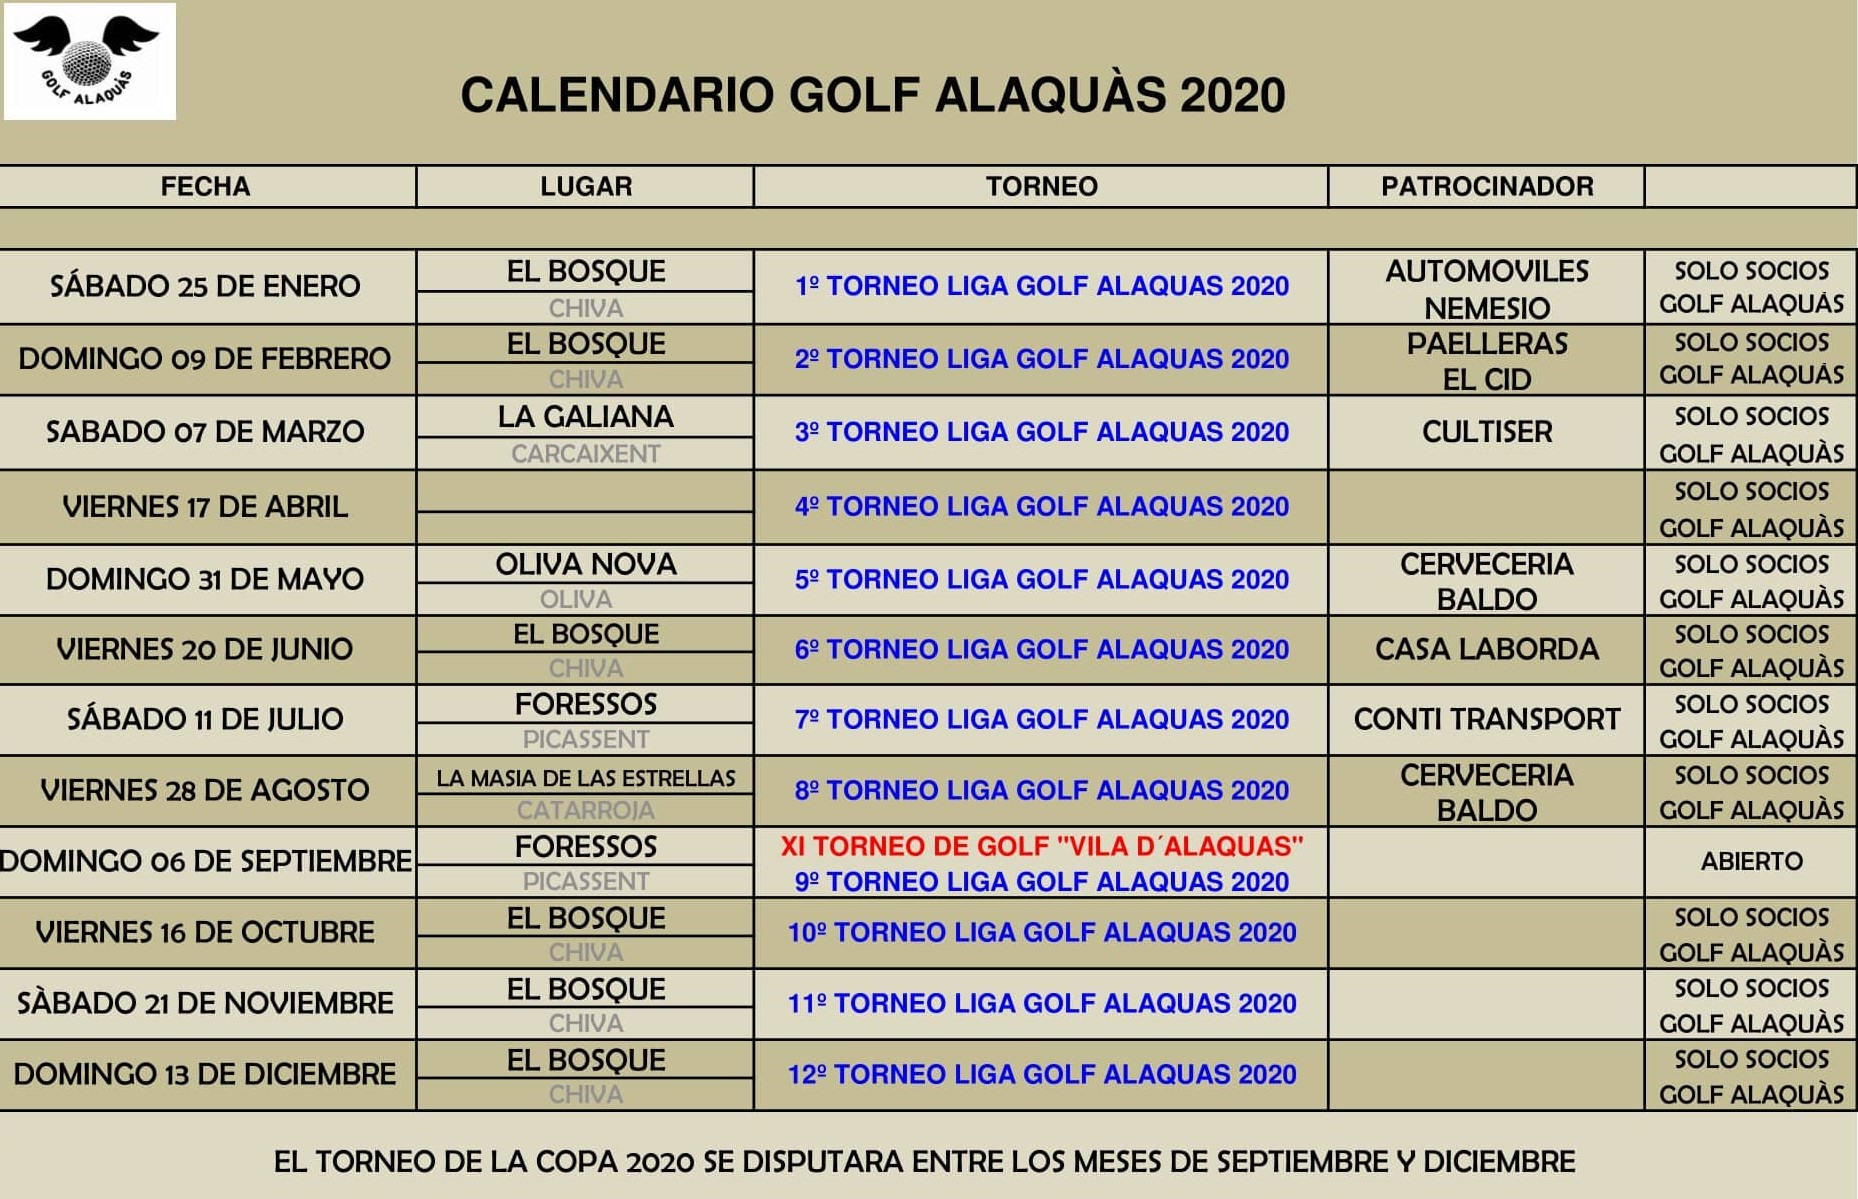 CALENDARIO GOLF ALAQUAS 2020